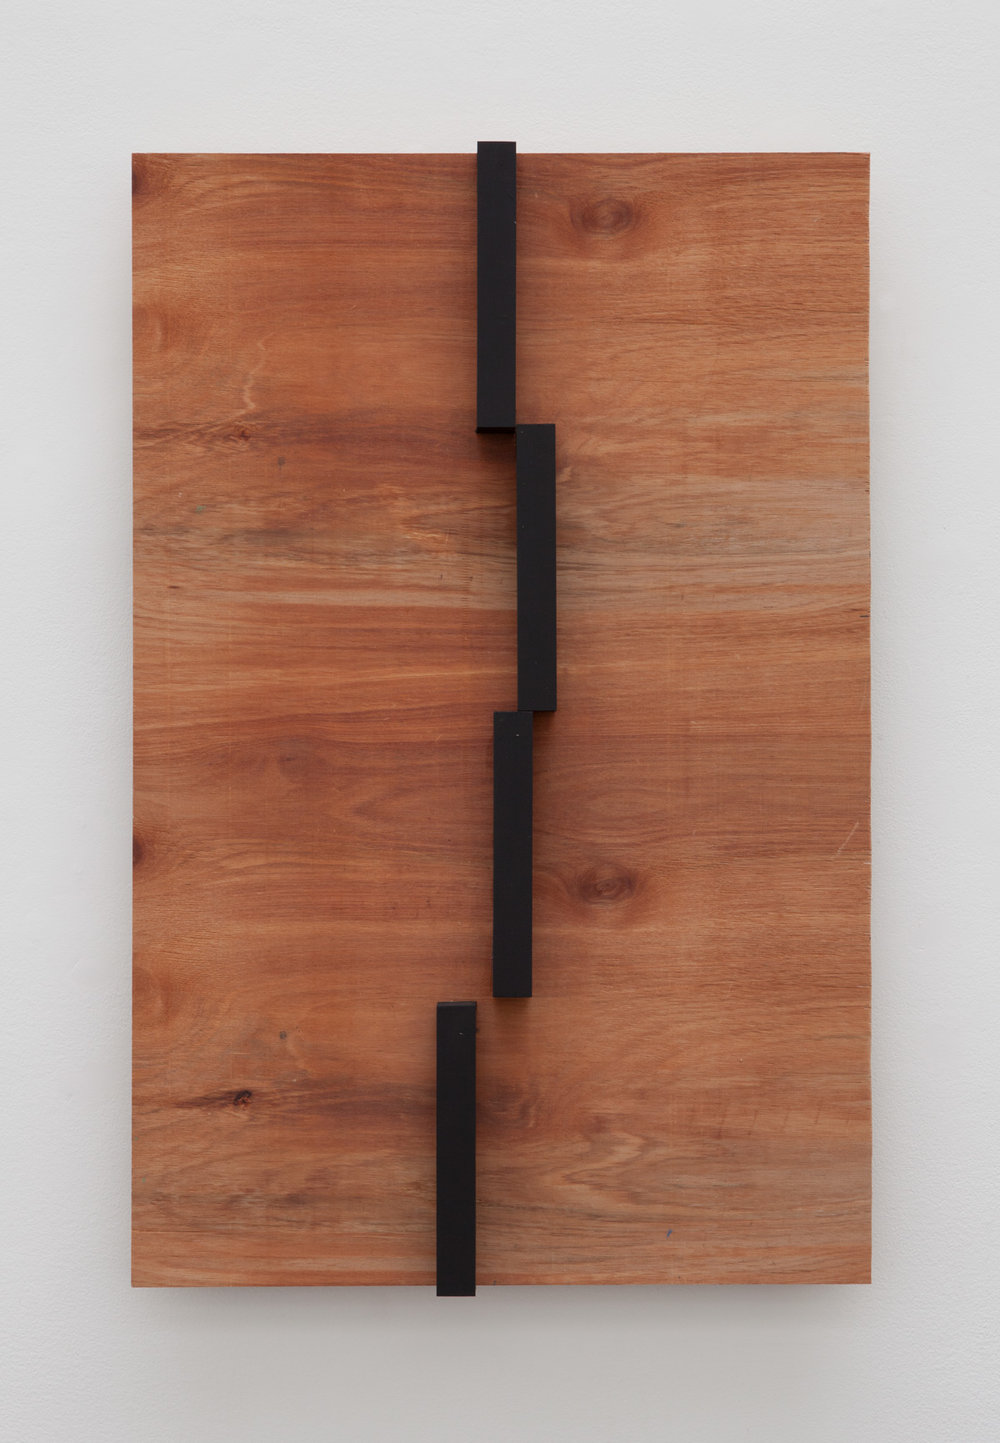 Oscillating Placement , 2015 揺場化 ( Yōjōka ) Wood, paint 35 3/8 x 23 x 3 3/4 inches 89.9 x 58.4 x 9.5 cm